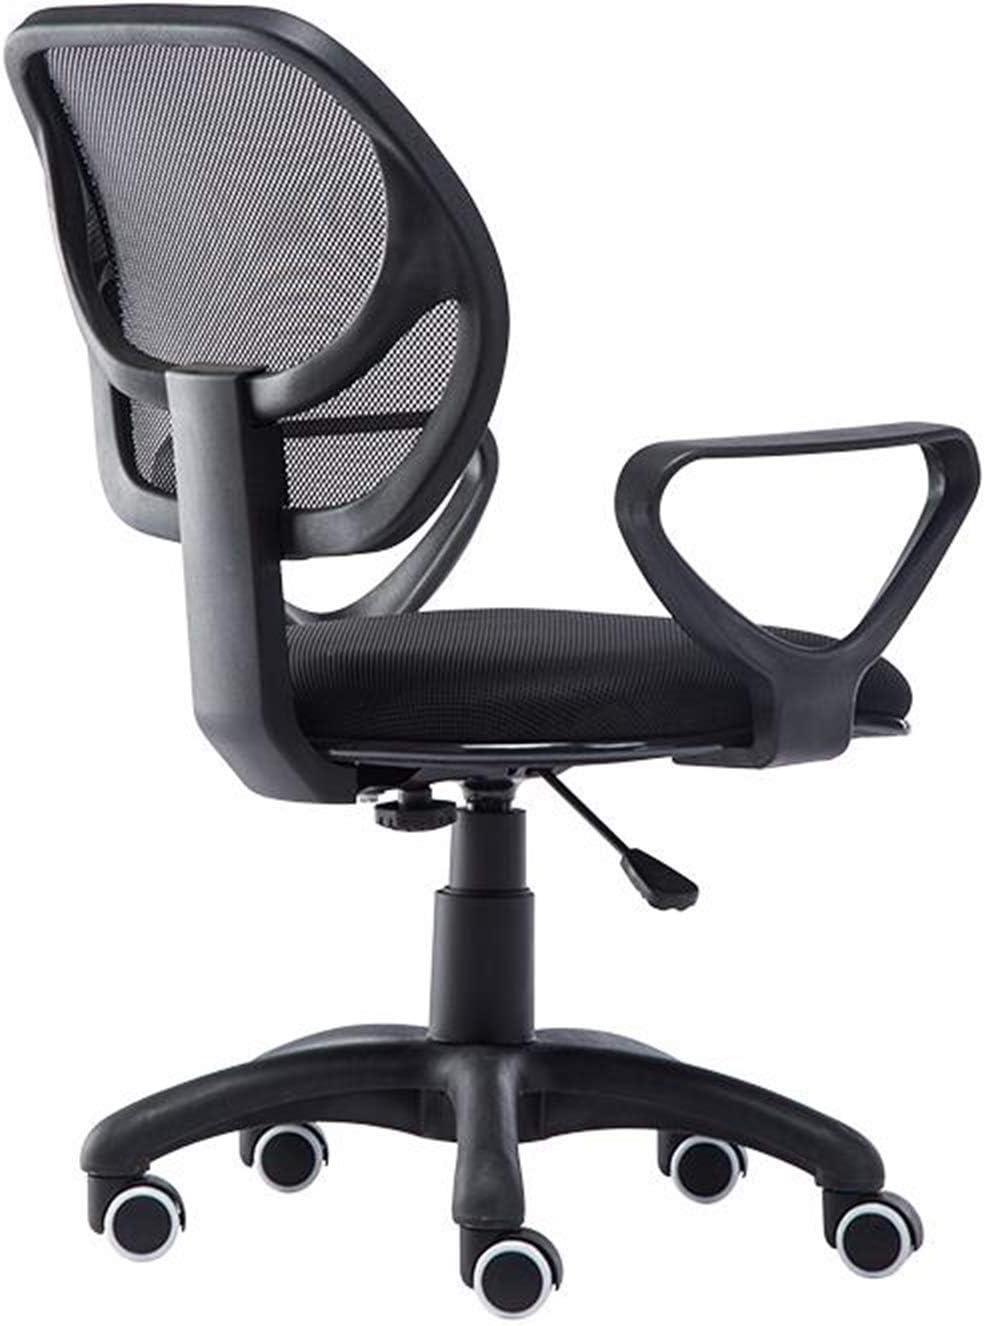 GCCBQM Office Award Chairs Computer Chair Max 55% OFF Desk Ergonomic